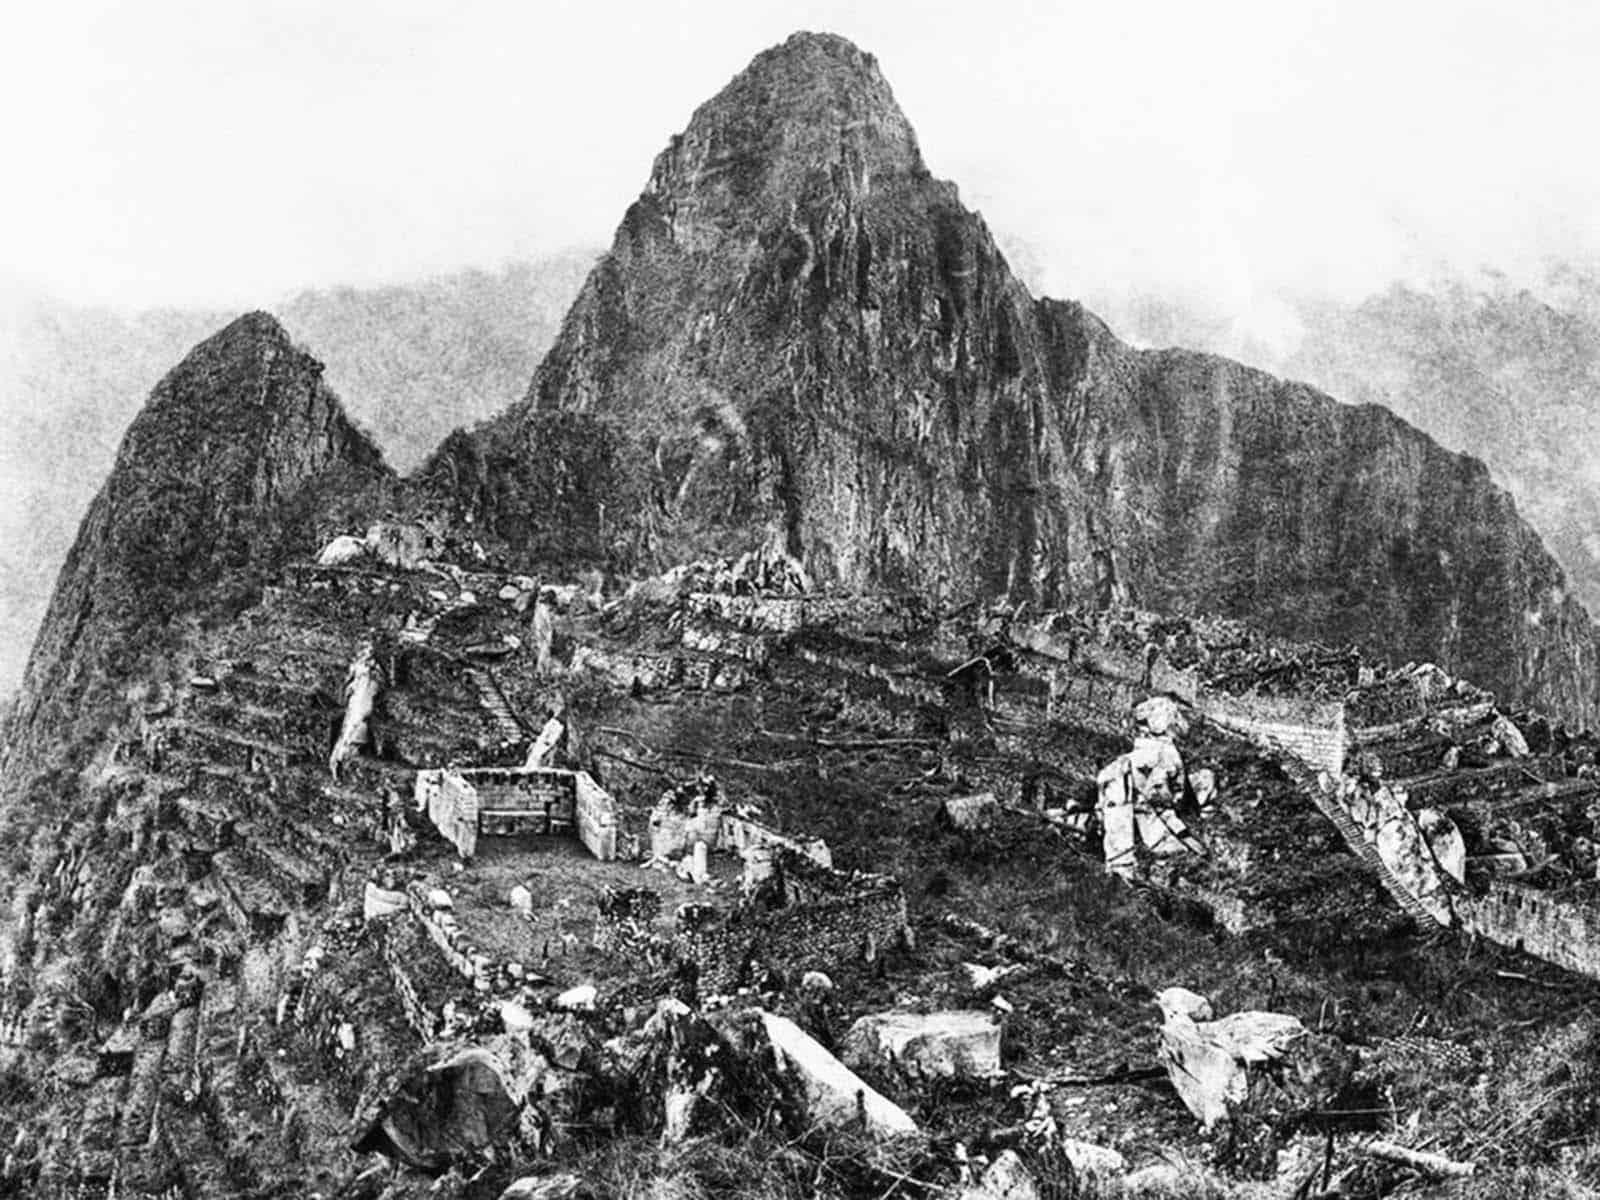 First Photograph of the Machu Picchu